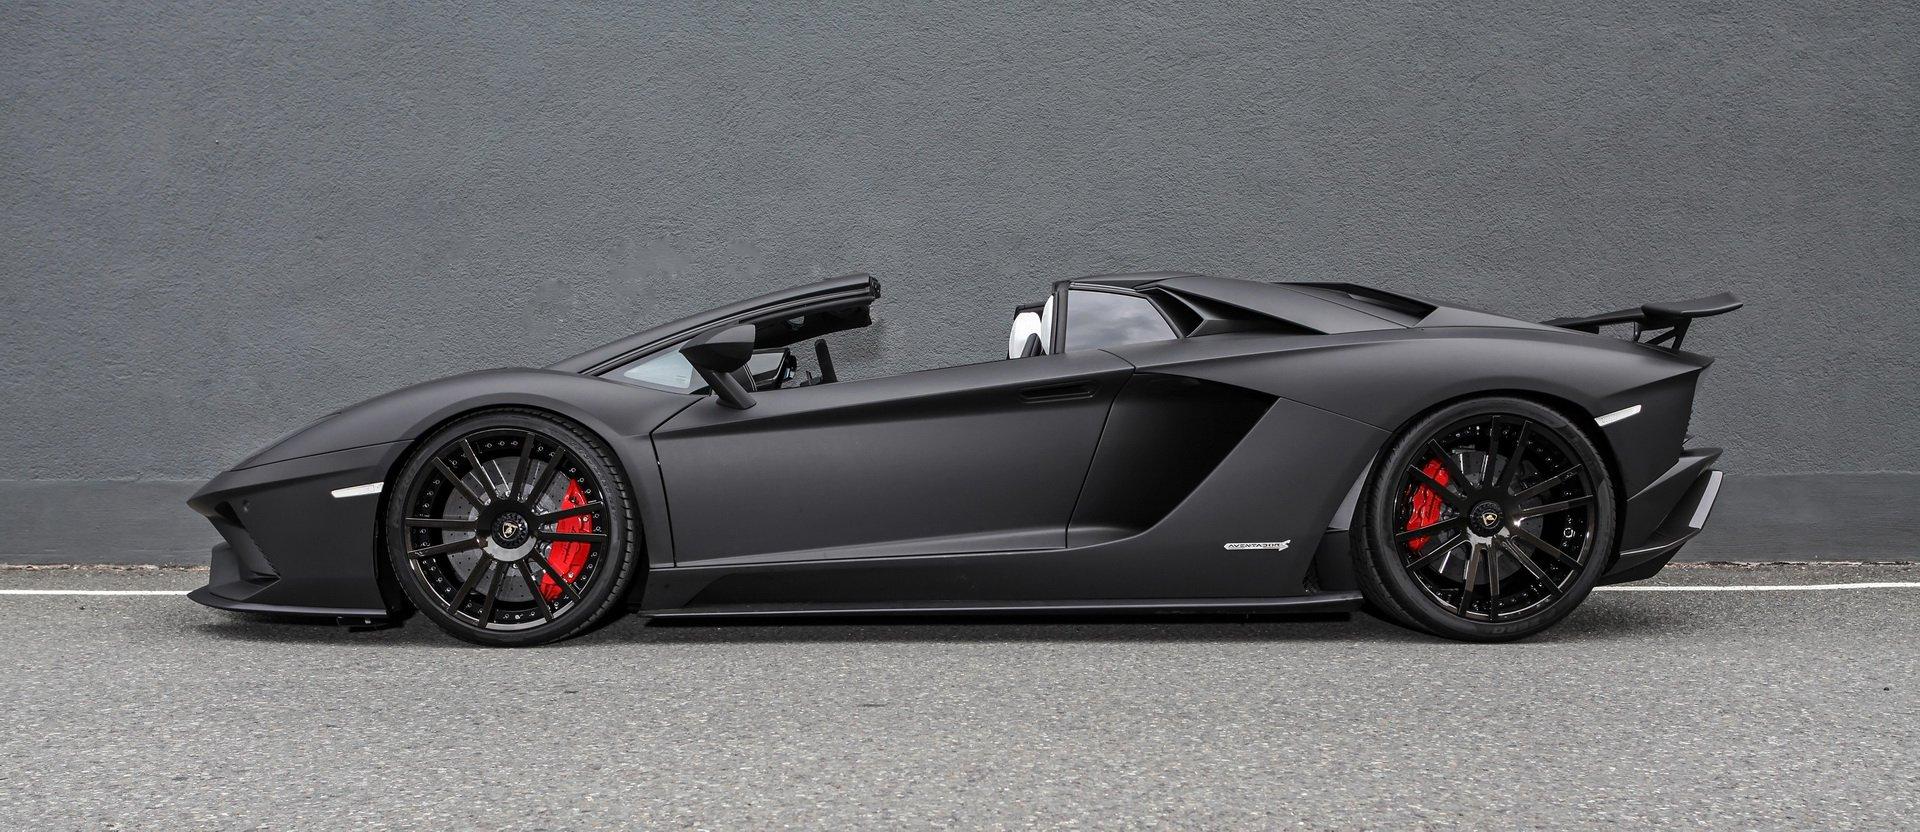 Lamborghini Aventador S Roadster by Wheelsandmore (19)